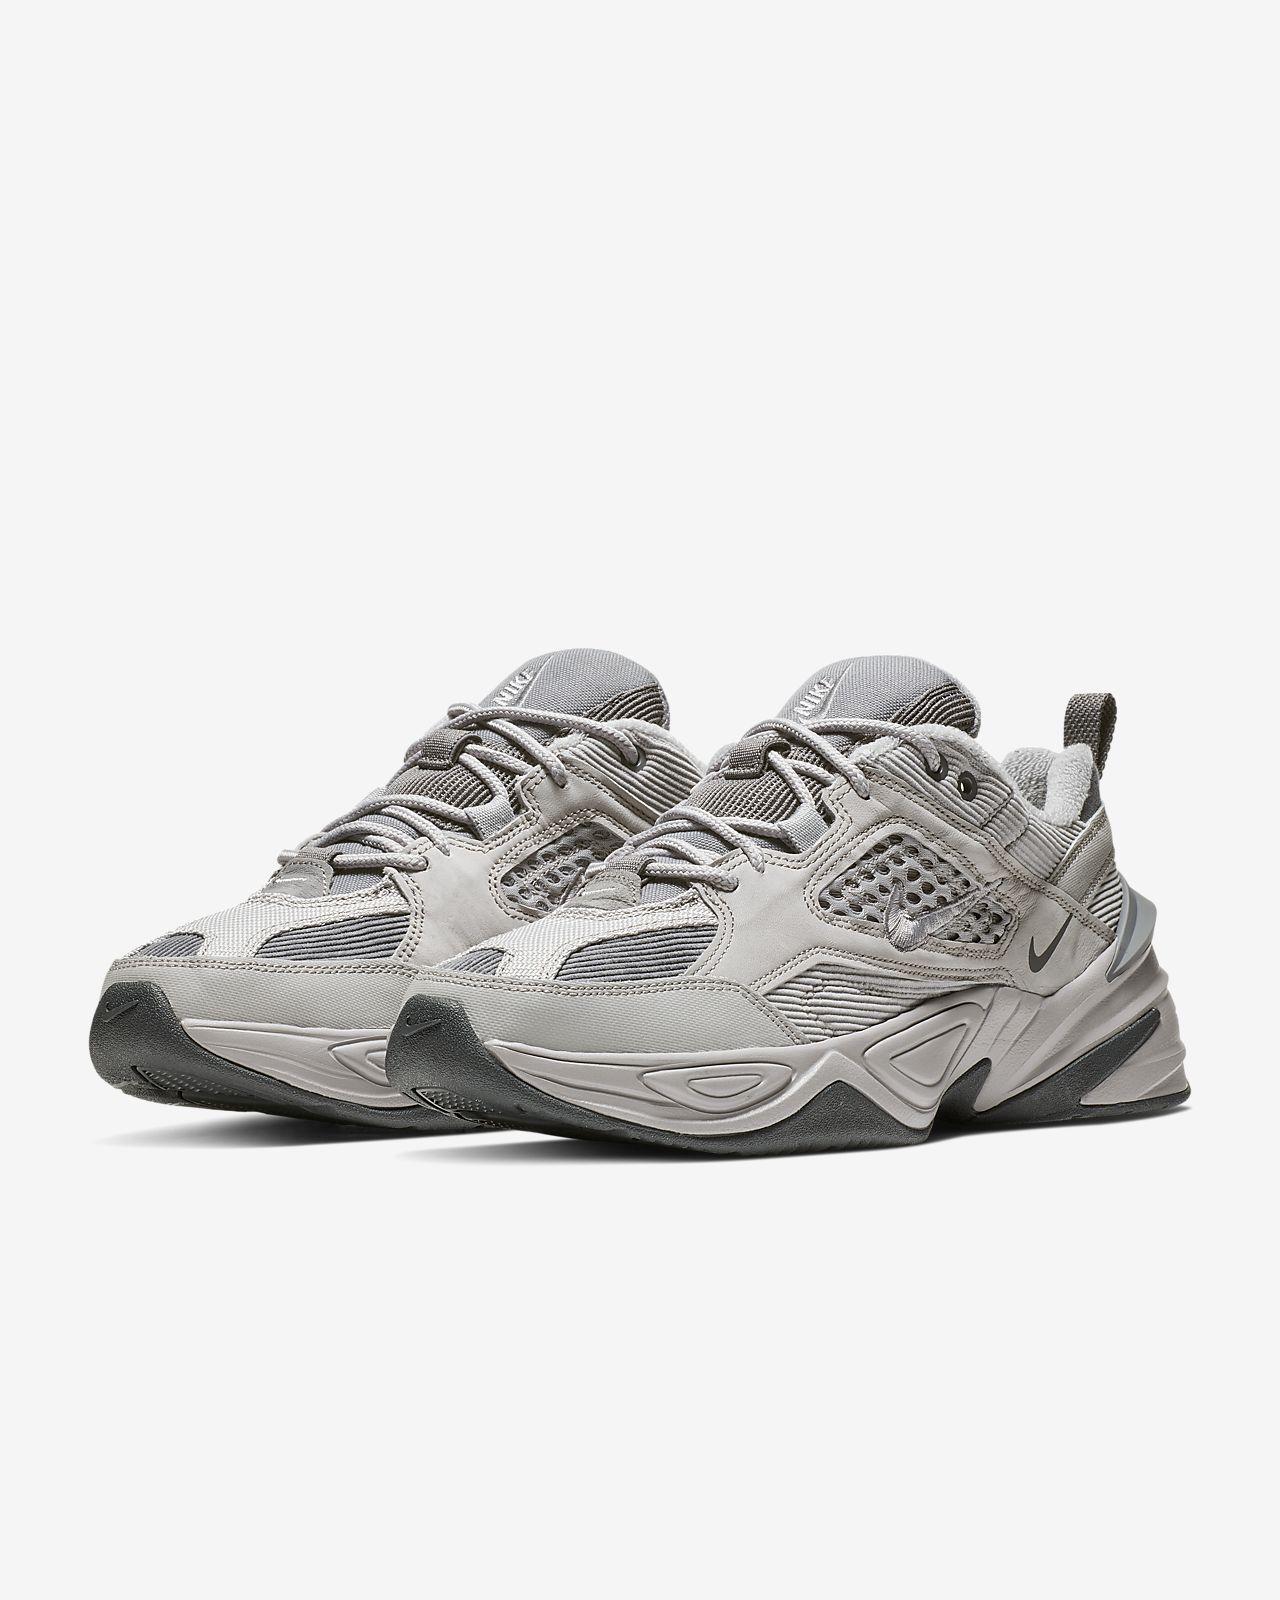 new style c03b1 0d5d2 ... Chaussure Nike M2K Tekno SP pour Homme